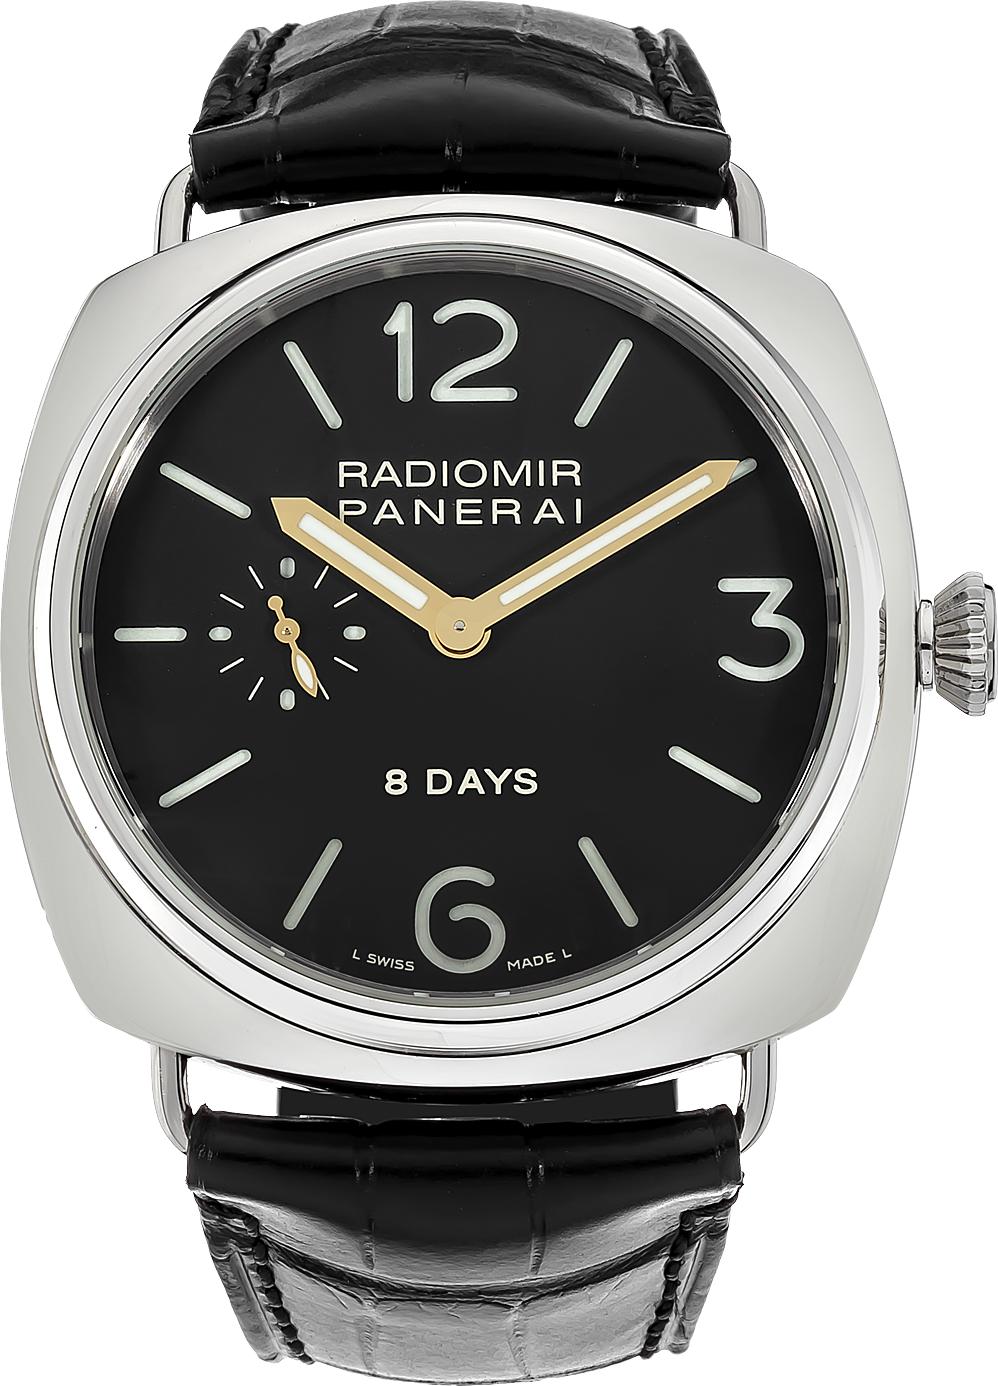 Panerai Radiomir 8 Days PAM 190